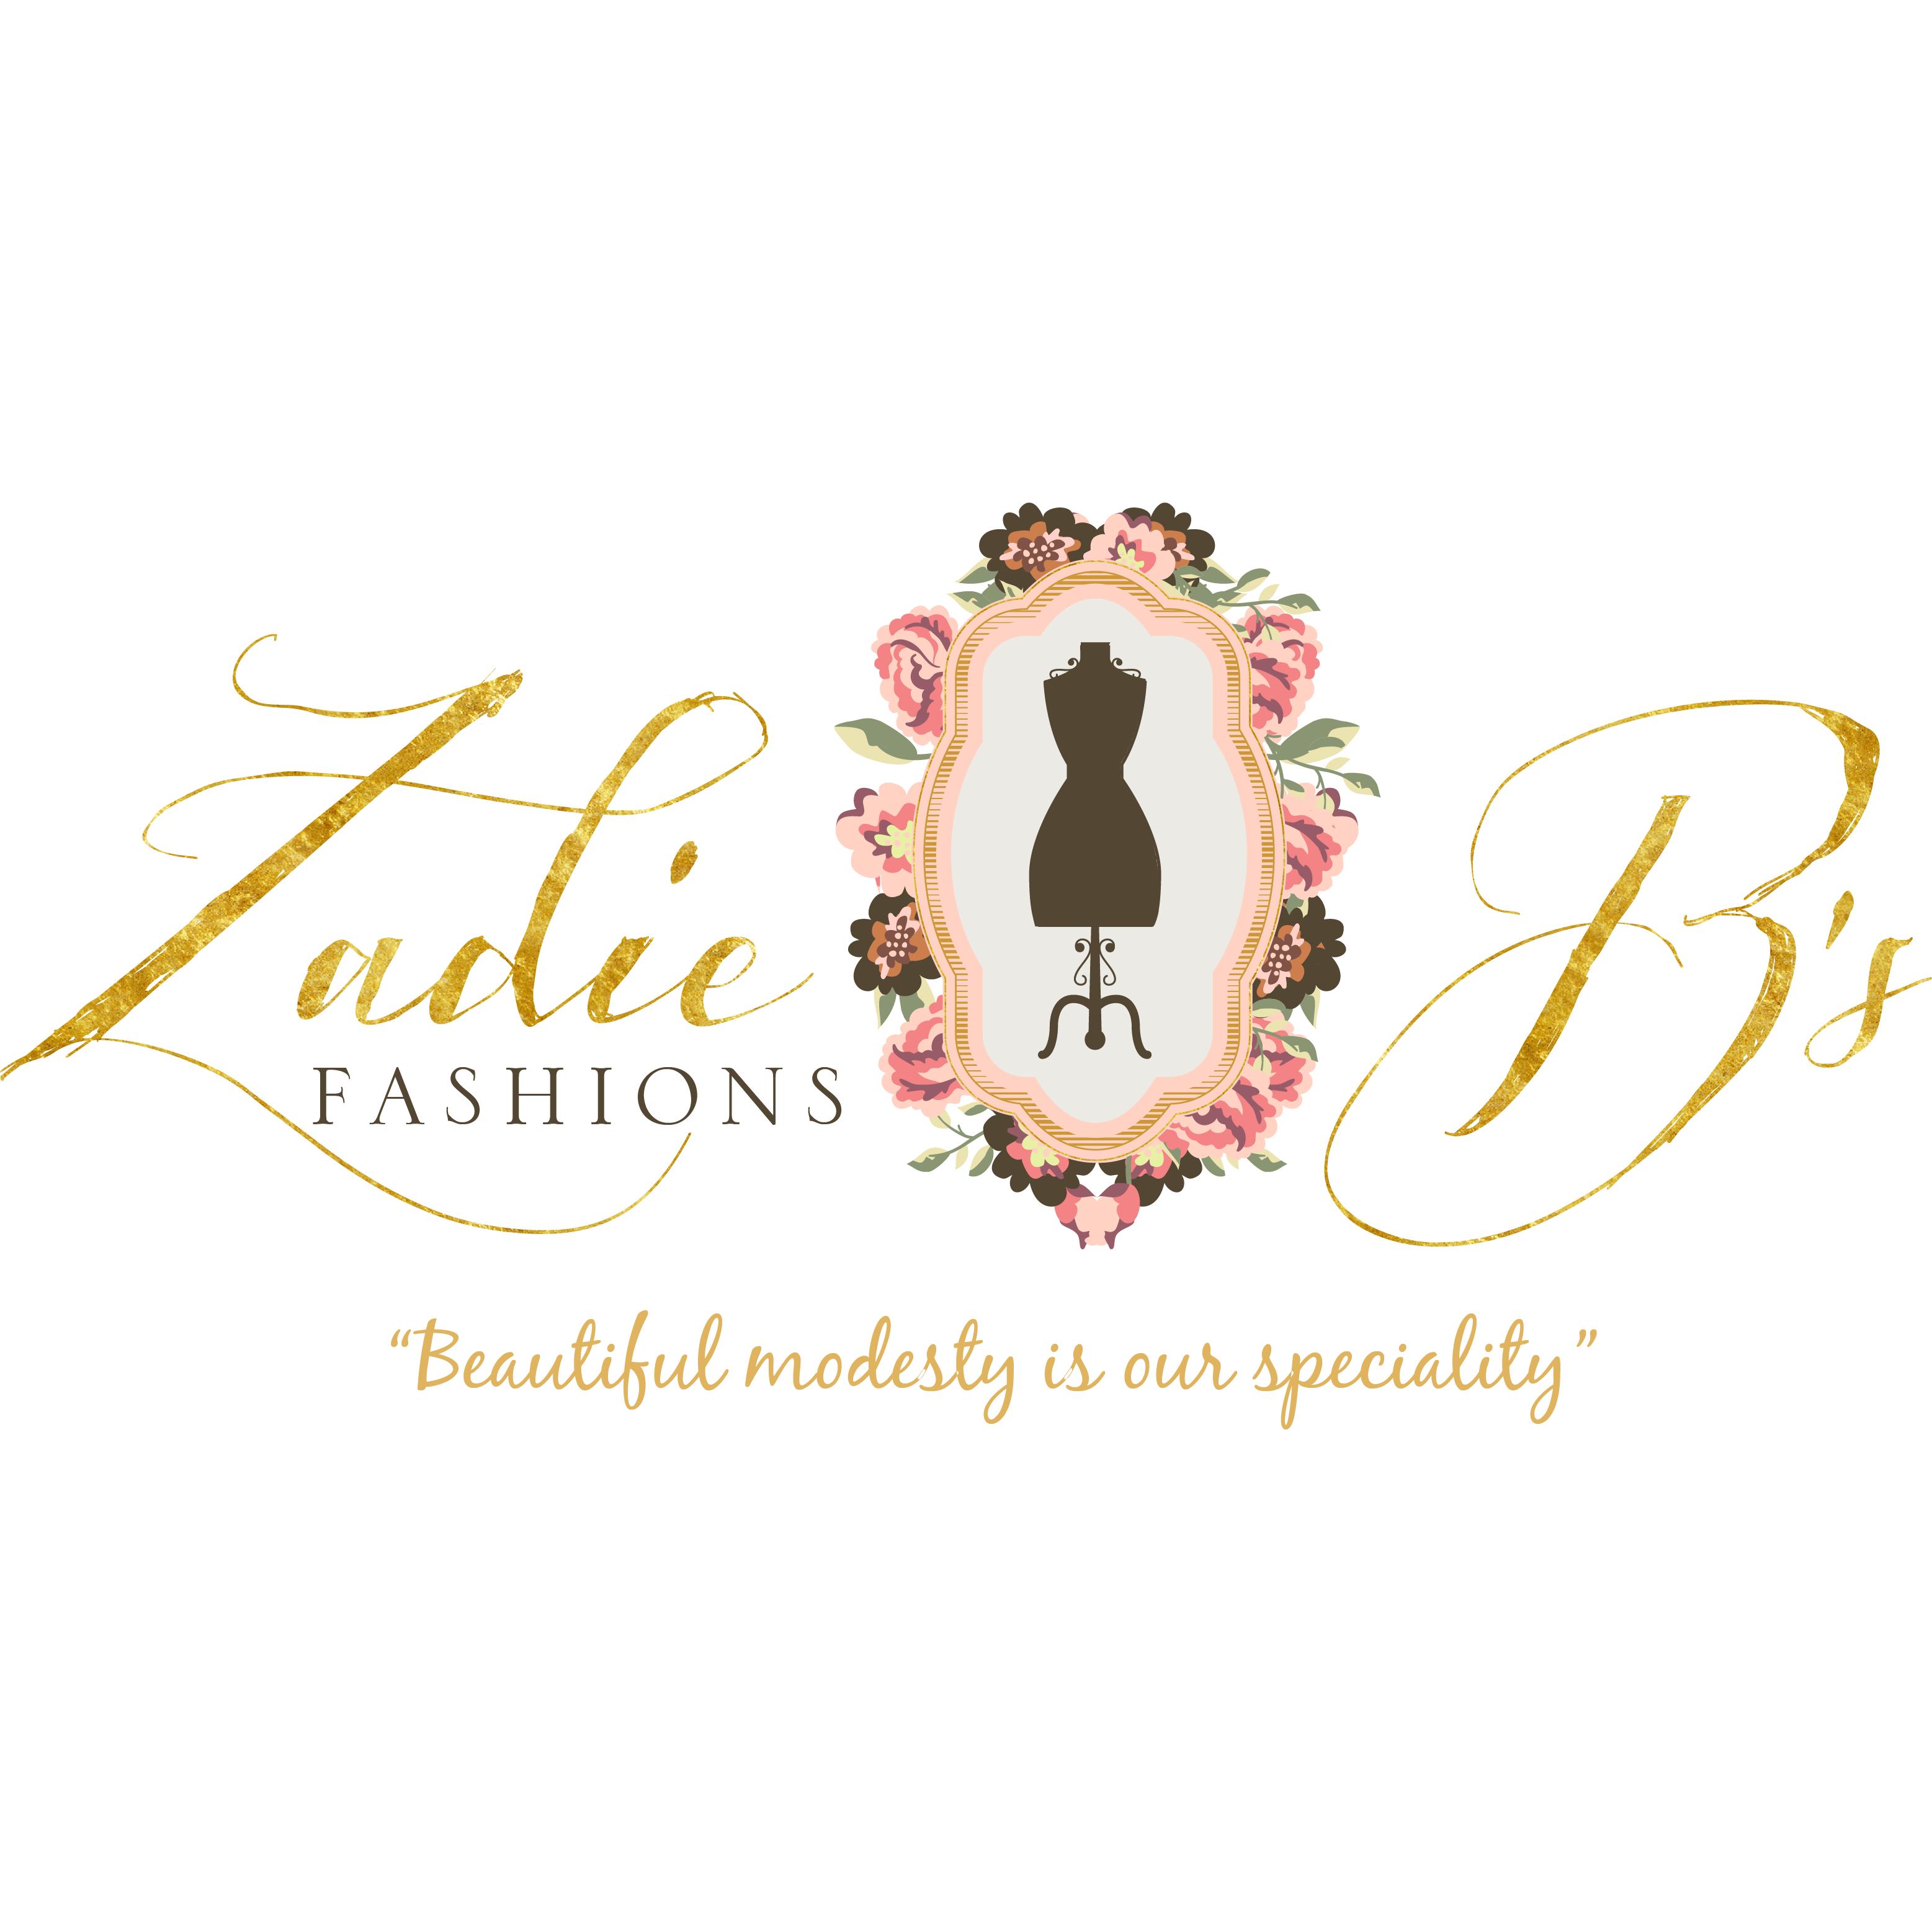 Zadie B's Fashions